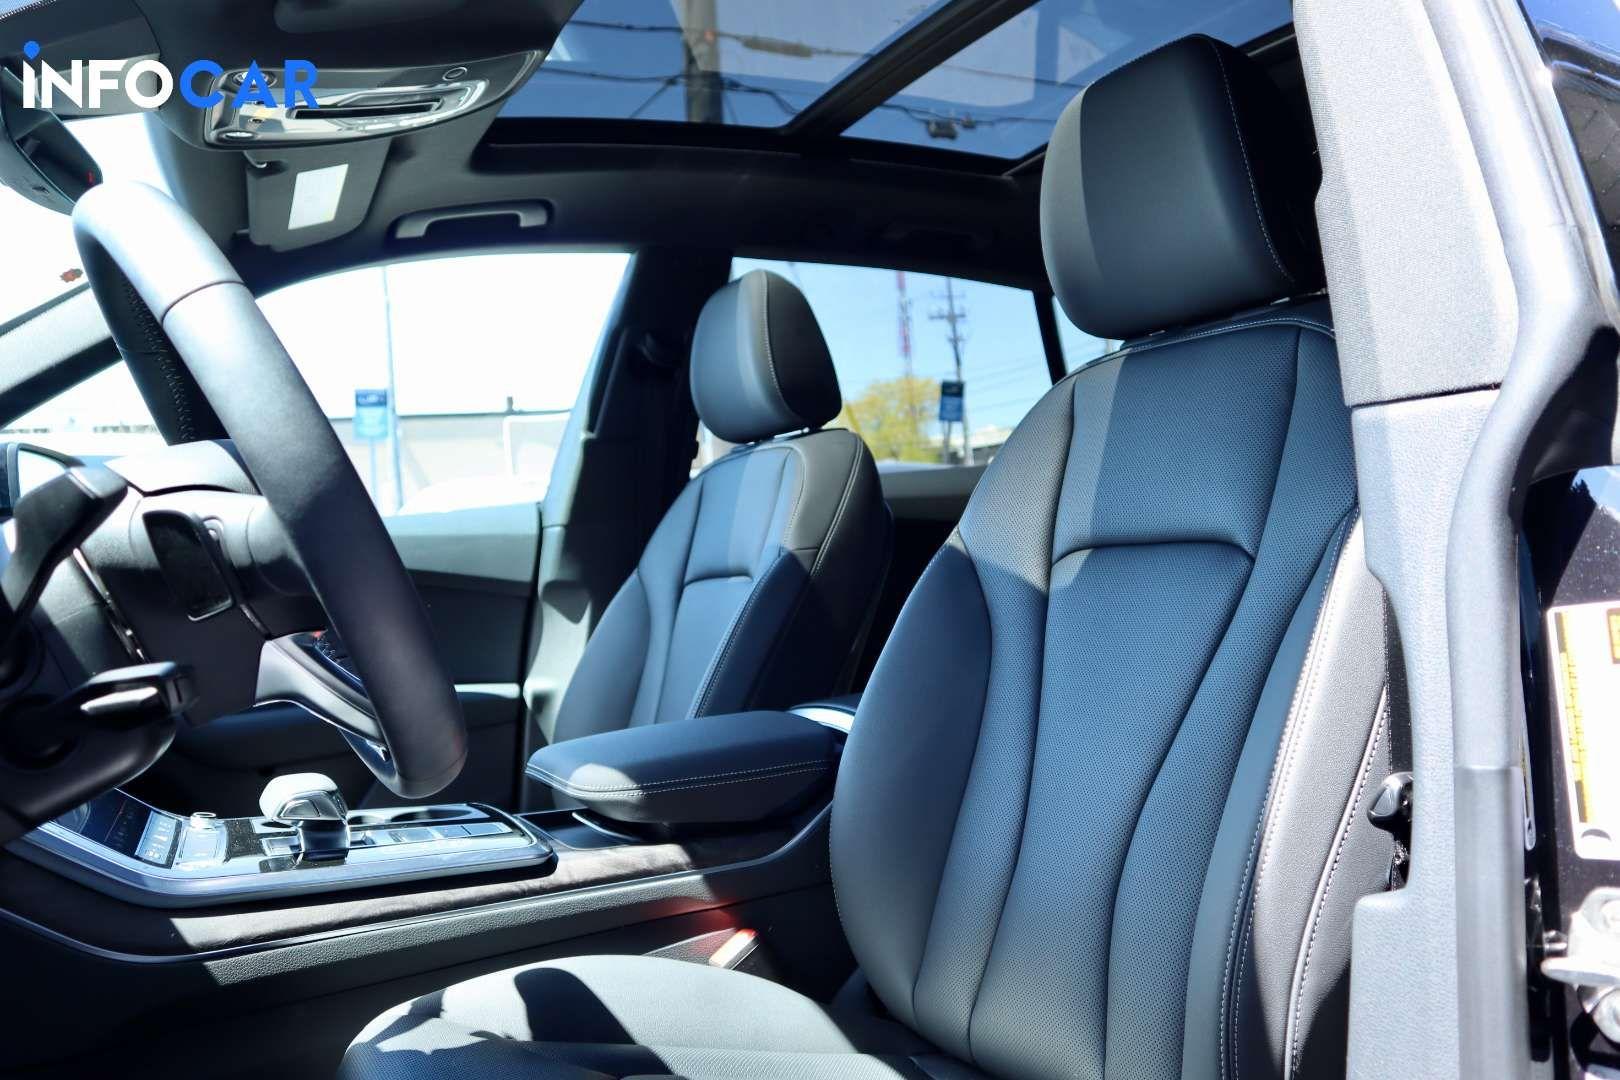 2019 Audi Q8 55TFSI Quattro S-Line - INFOCAR - Toronto's Most Comprehensive New and Used Auto Trading Platform